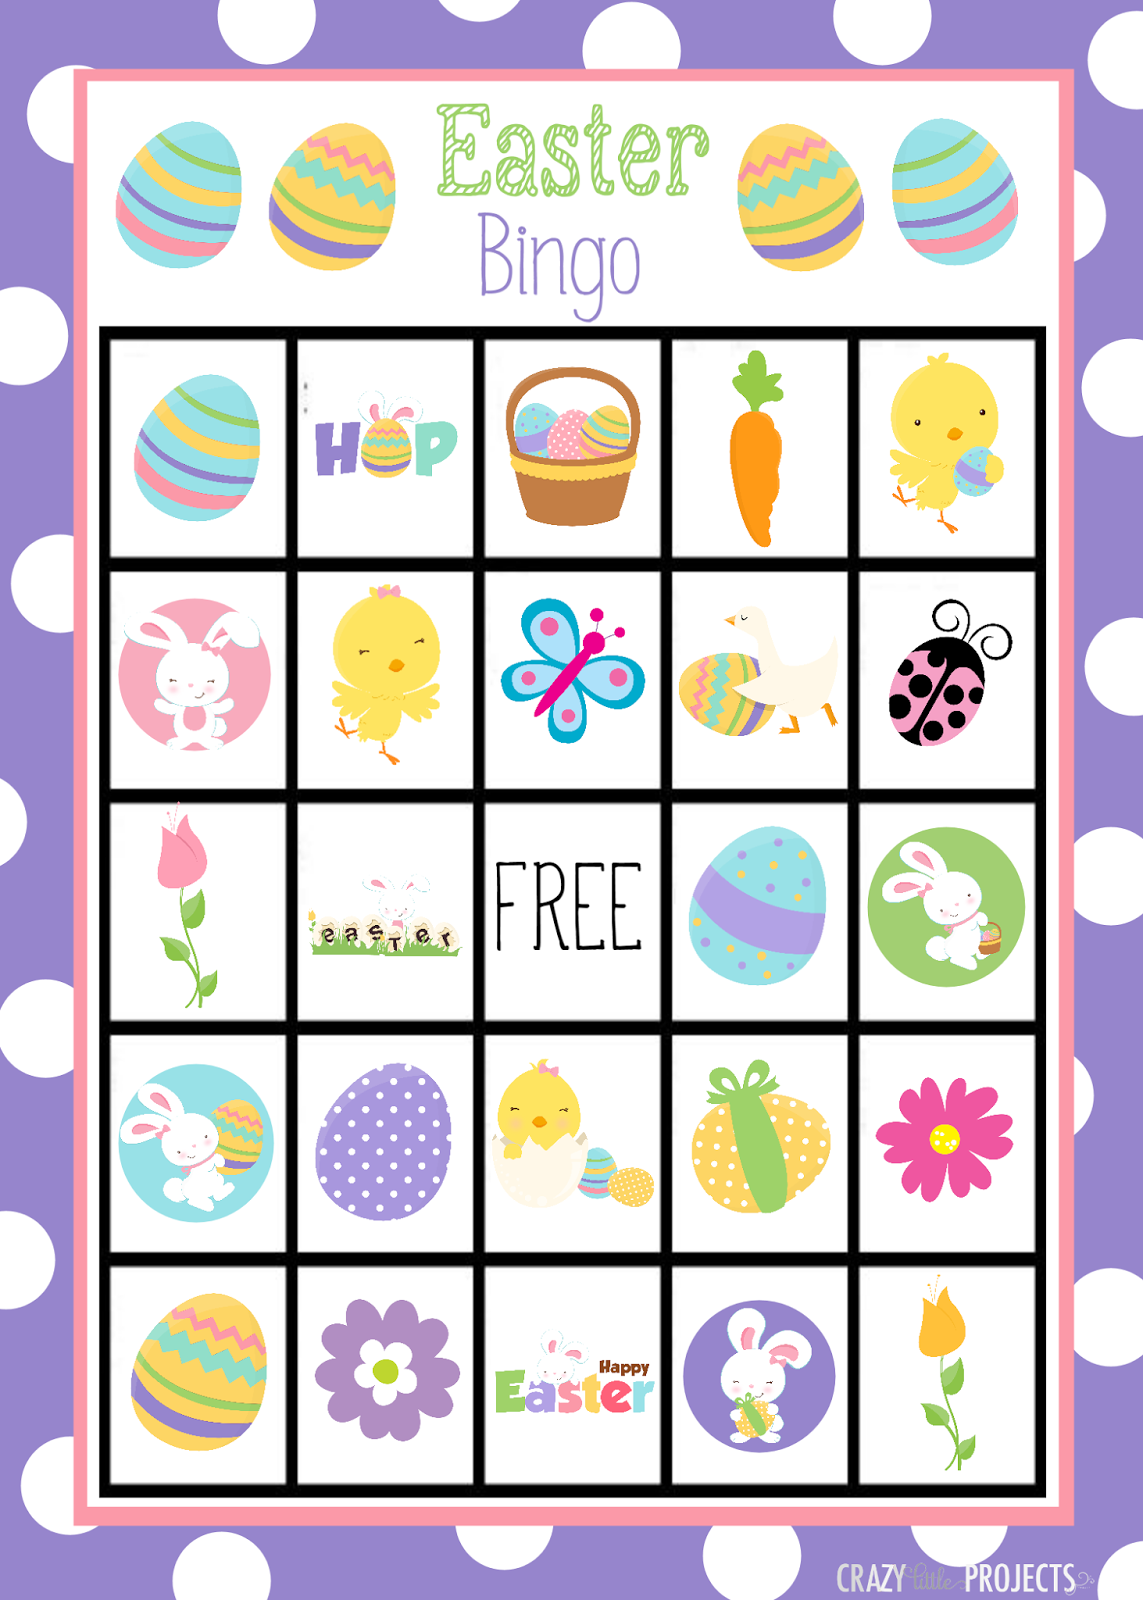 Dynamic image with regard to spring bingo game printable